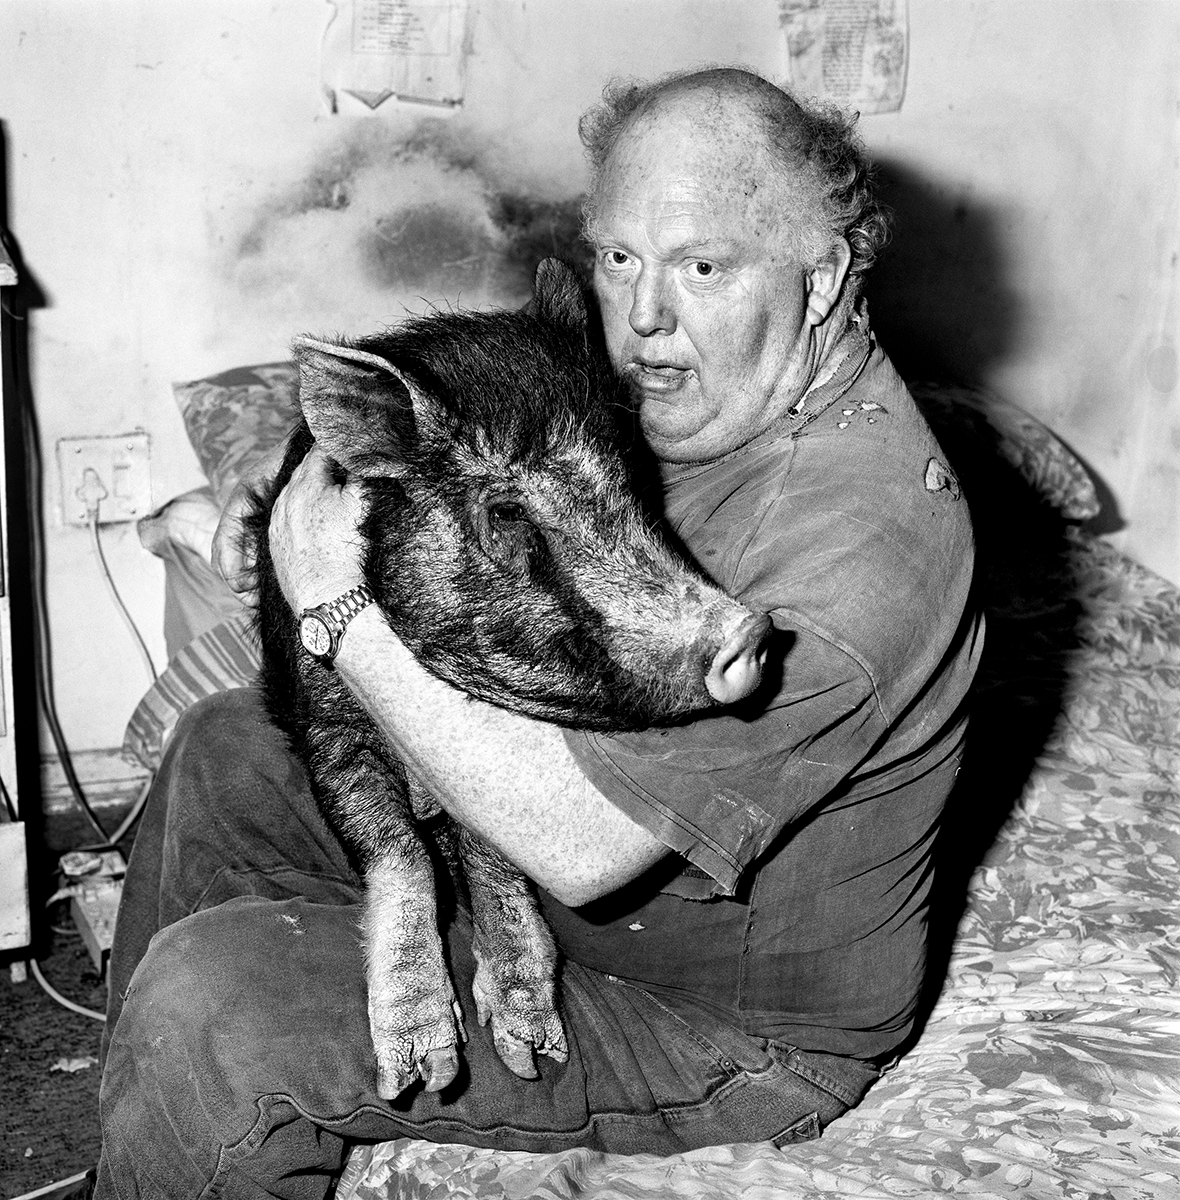 Brian with pet pig, 1998, Roger Ballen.